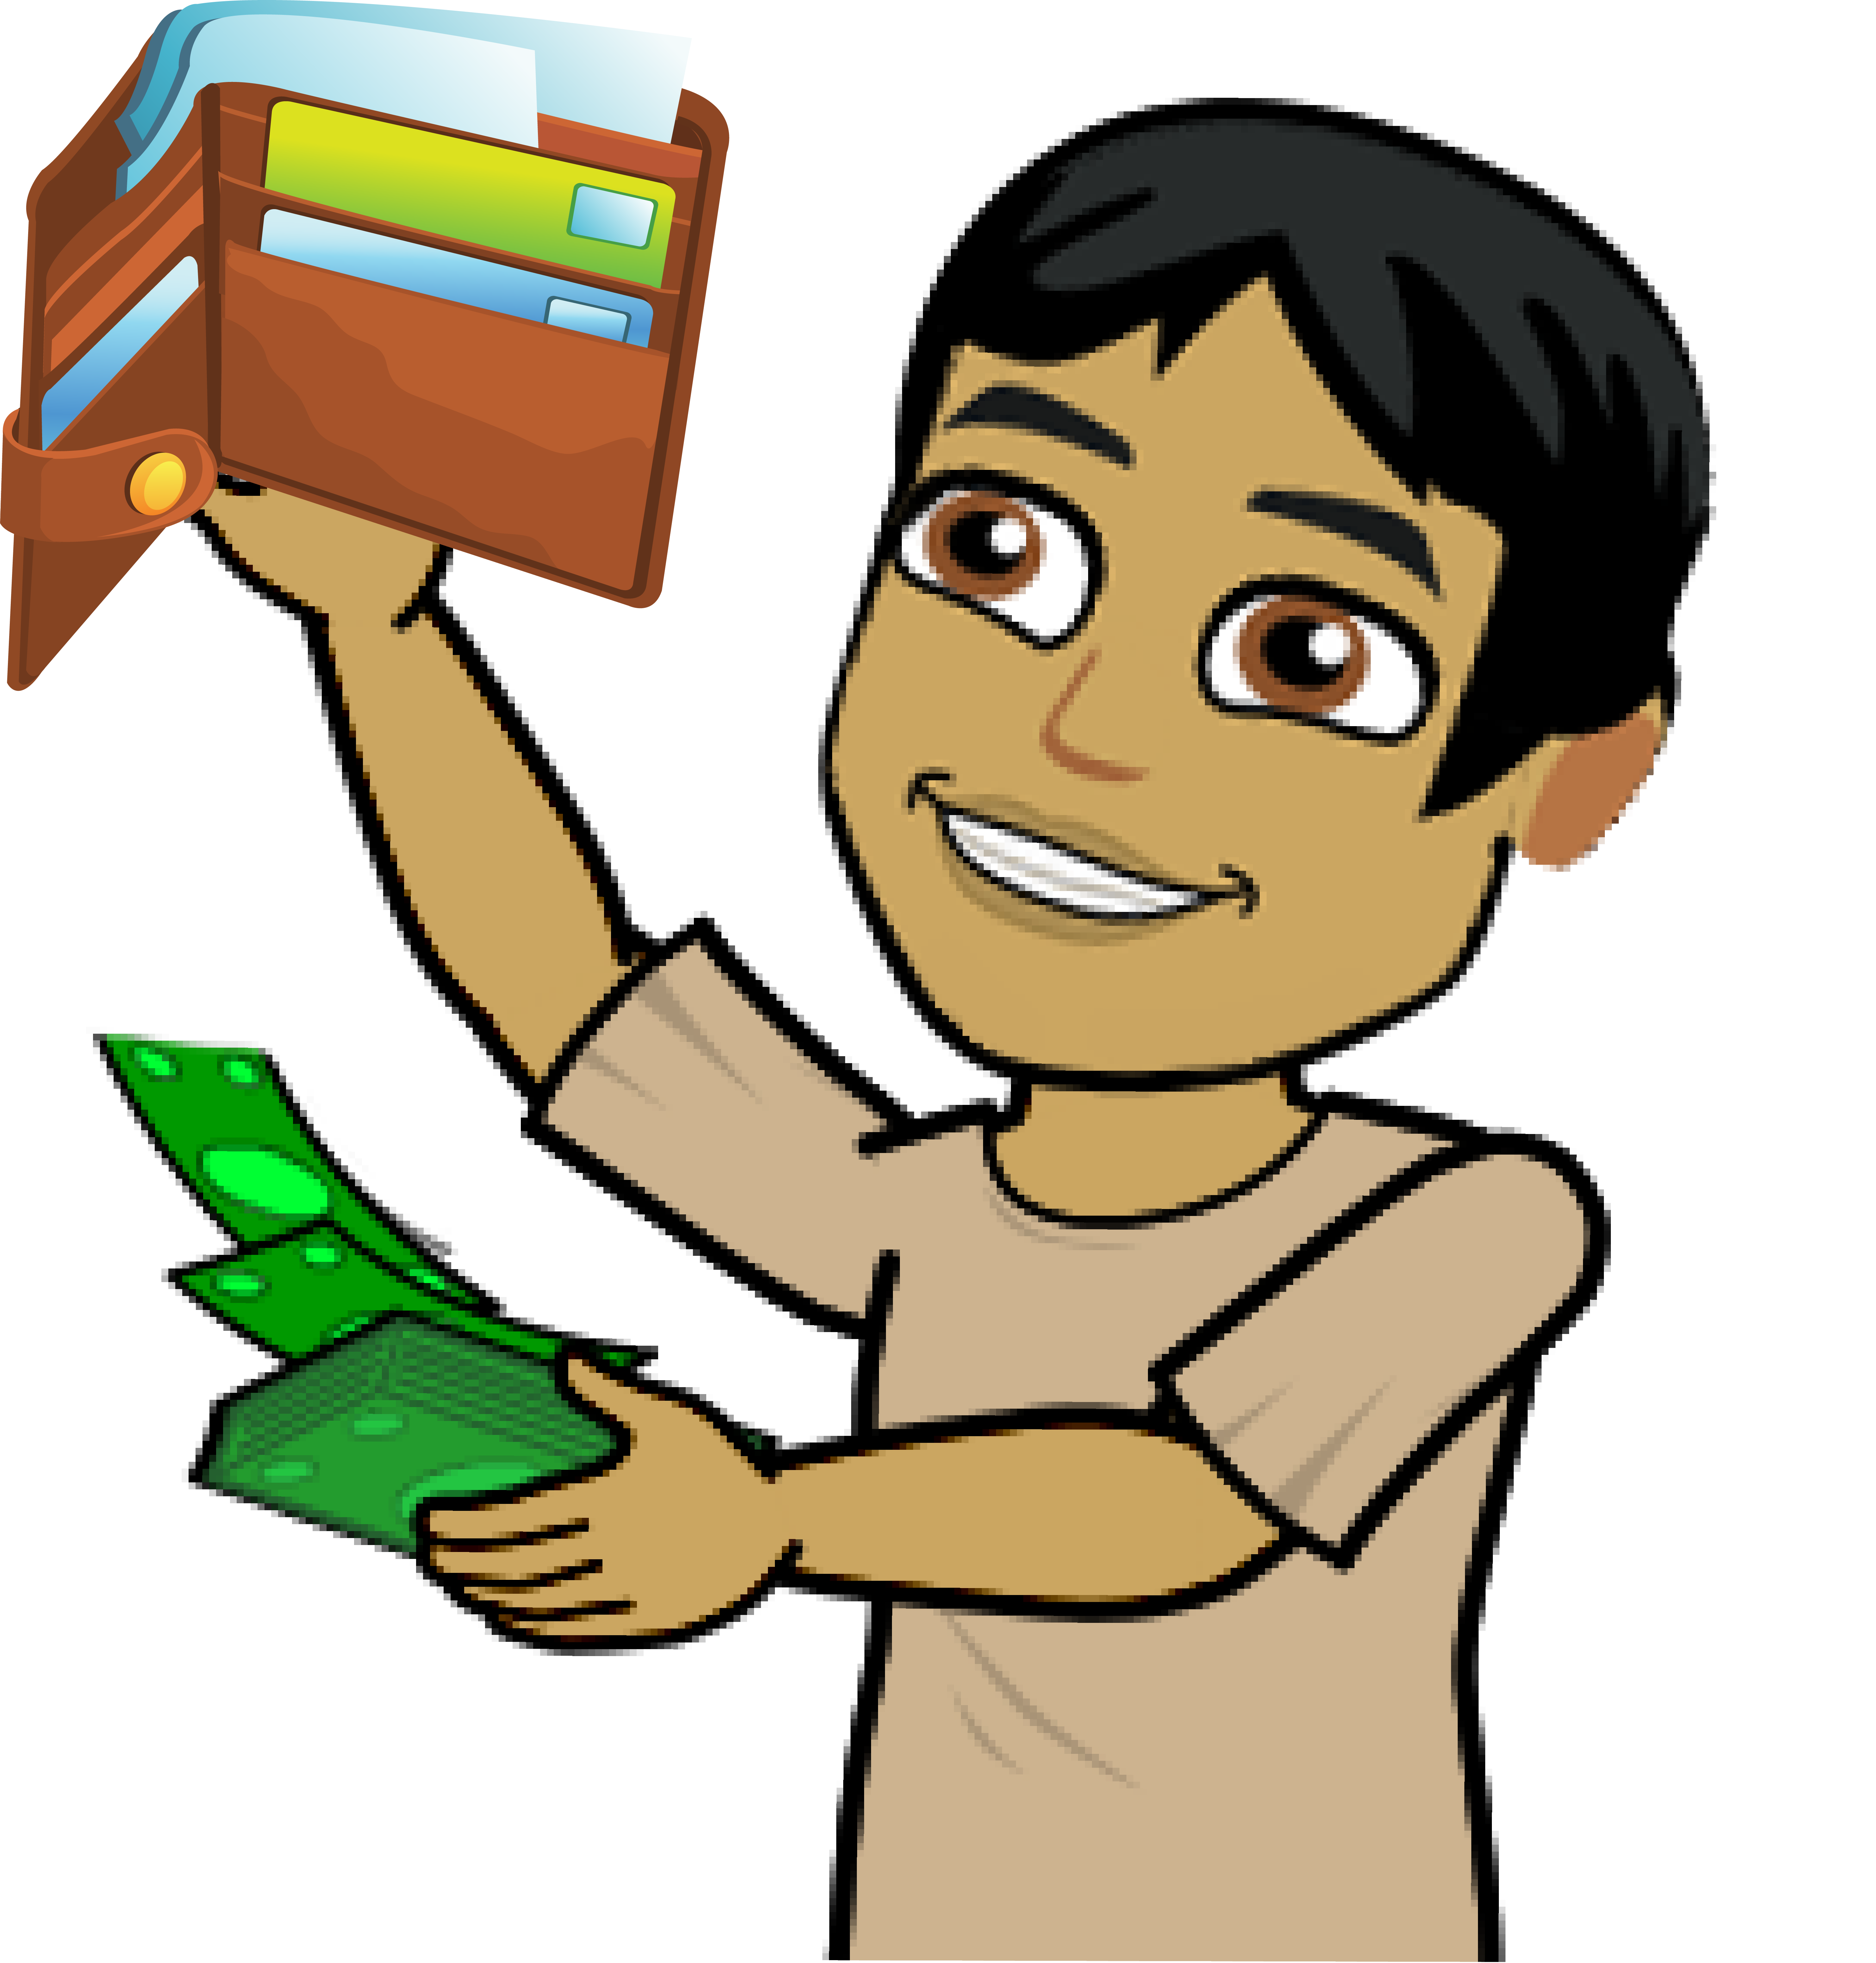 Wellnesswallet png rent matters. Wallet clipart enough money